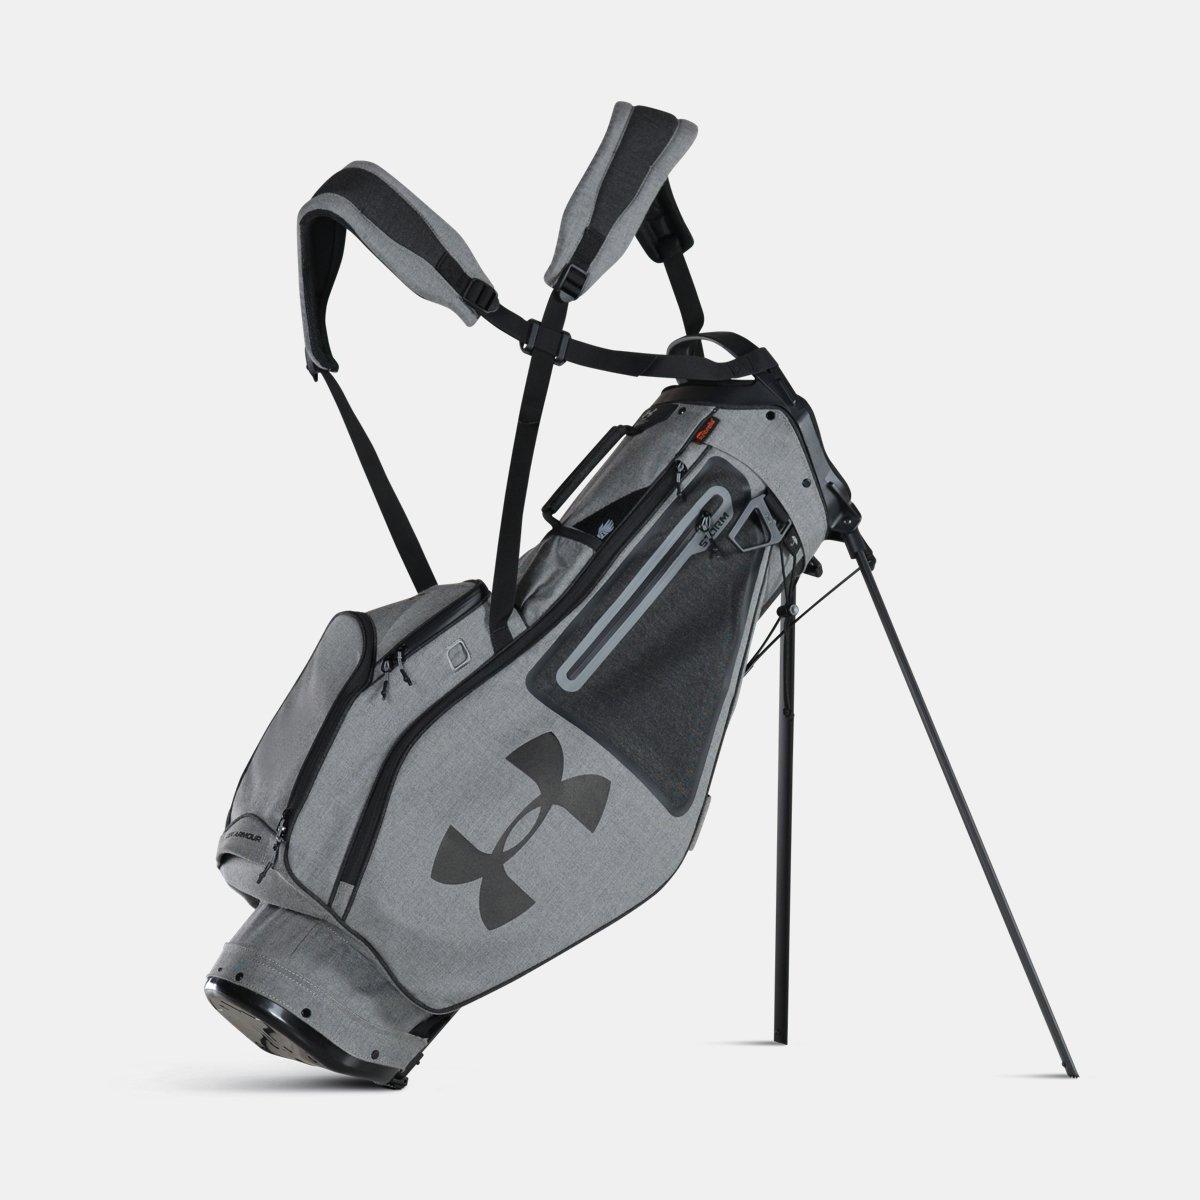 [UNDER ARMOUR] アンダーアーマー Men's UA Storm Speedround Sunbrella Golf Bag GRAPHITE MEDIUM HEATHER [並行輸入品]   B074Z4WZ3H